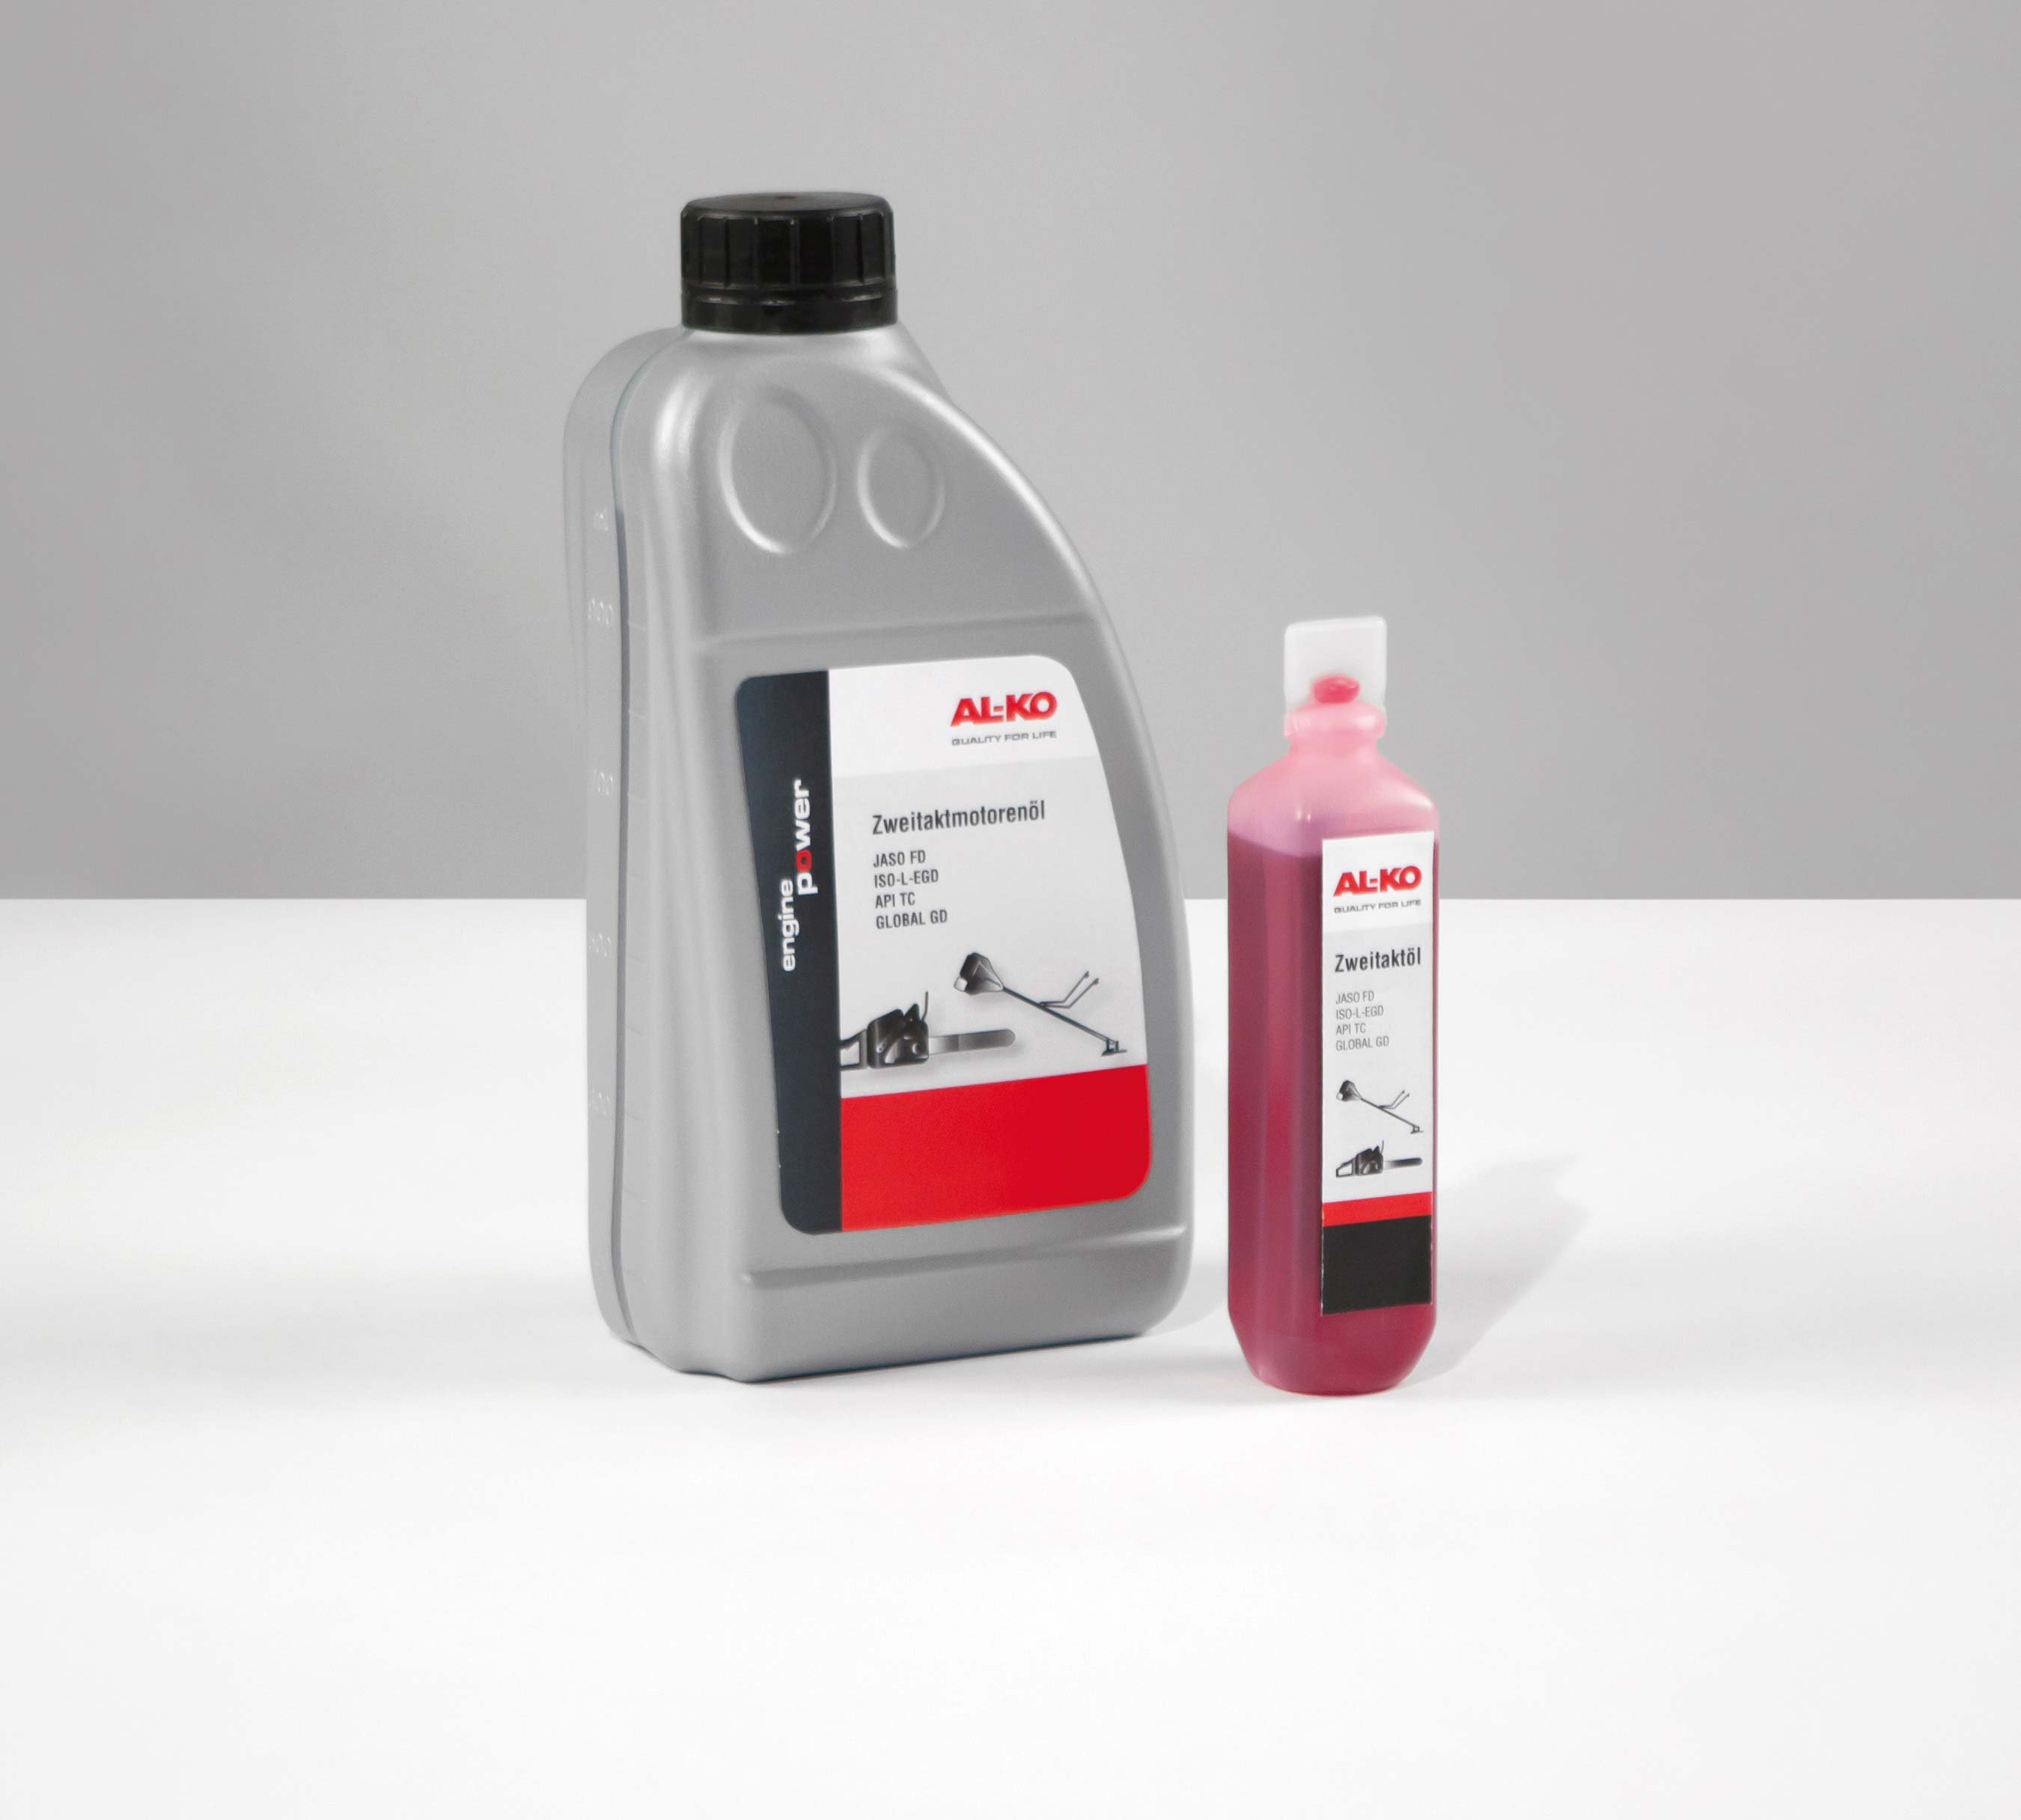 AL-KO 2-Takt Motorsensen-/ Kettensägeöl 1 Liter Bild 1